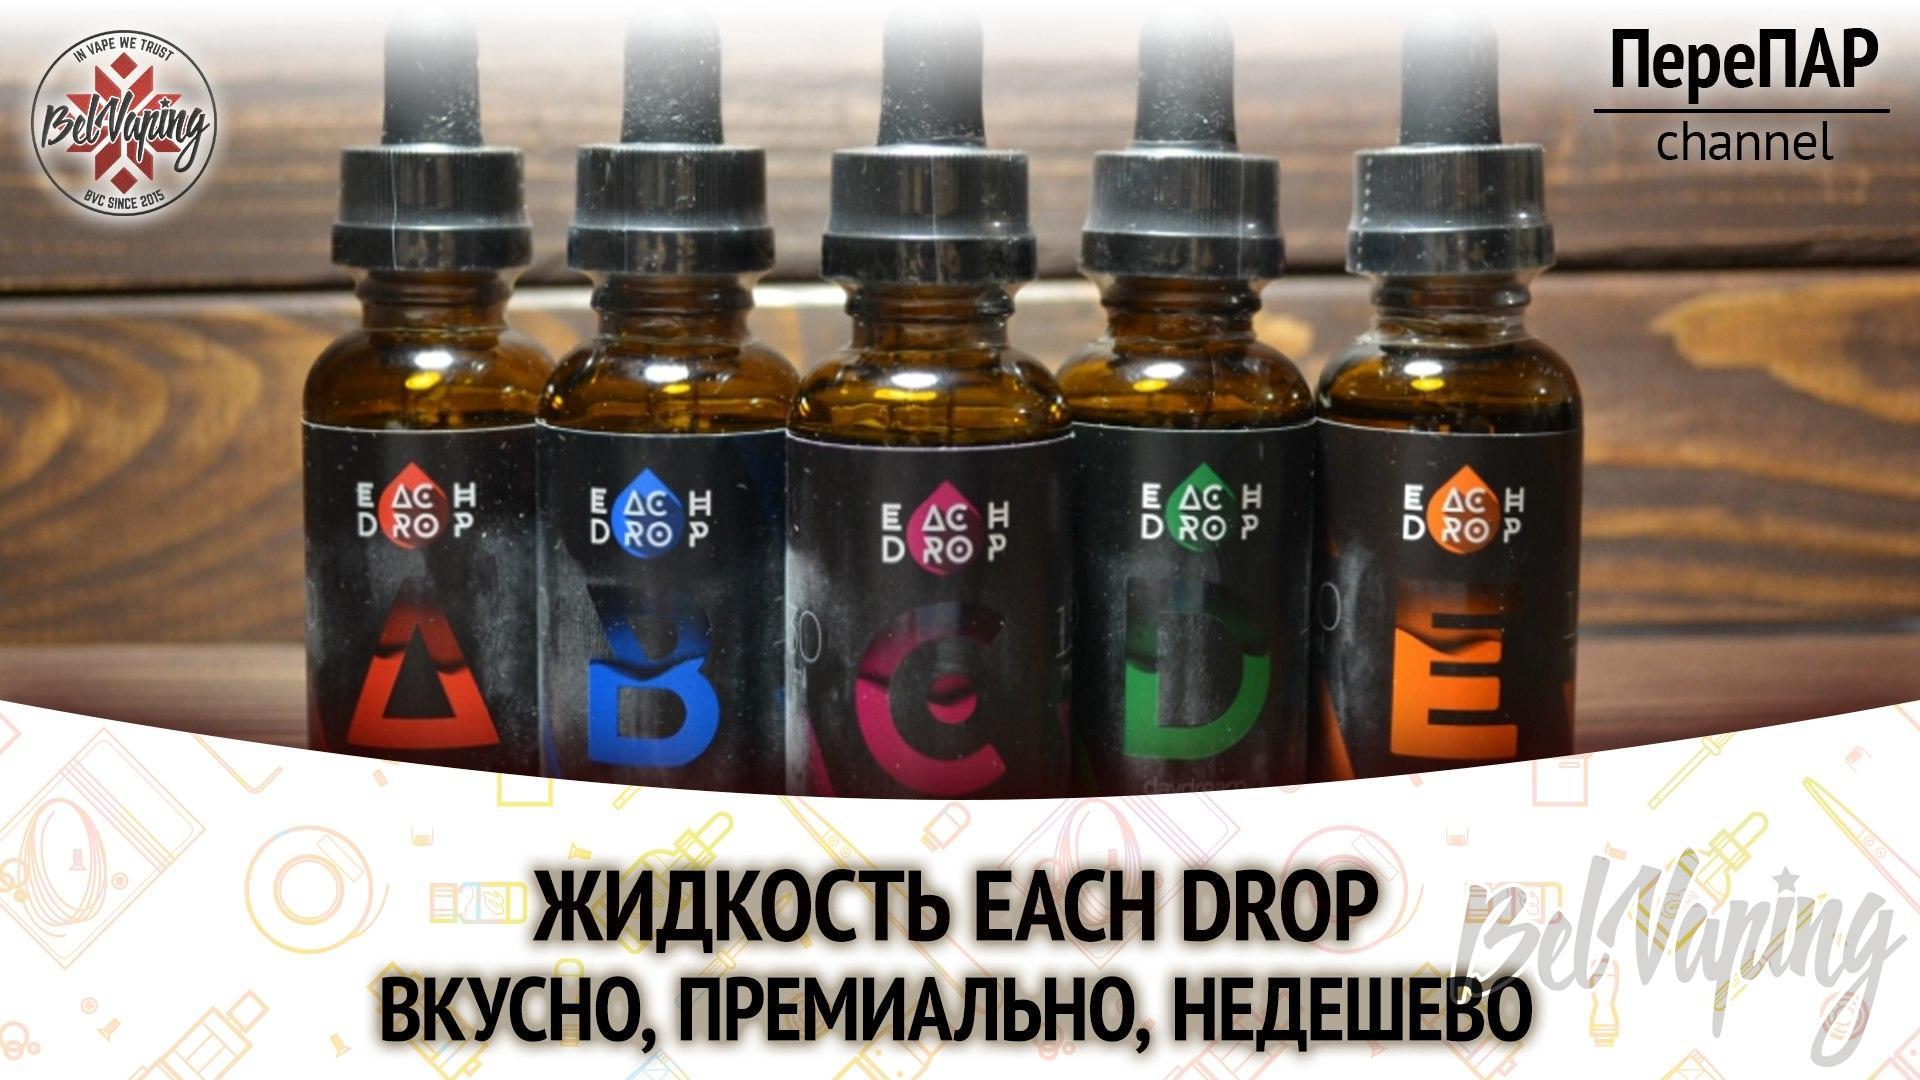 Обзор жидкости для вейпинга Each Drop